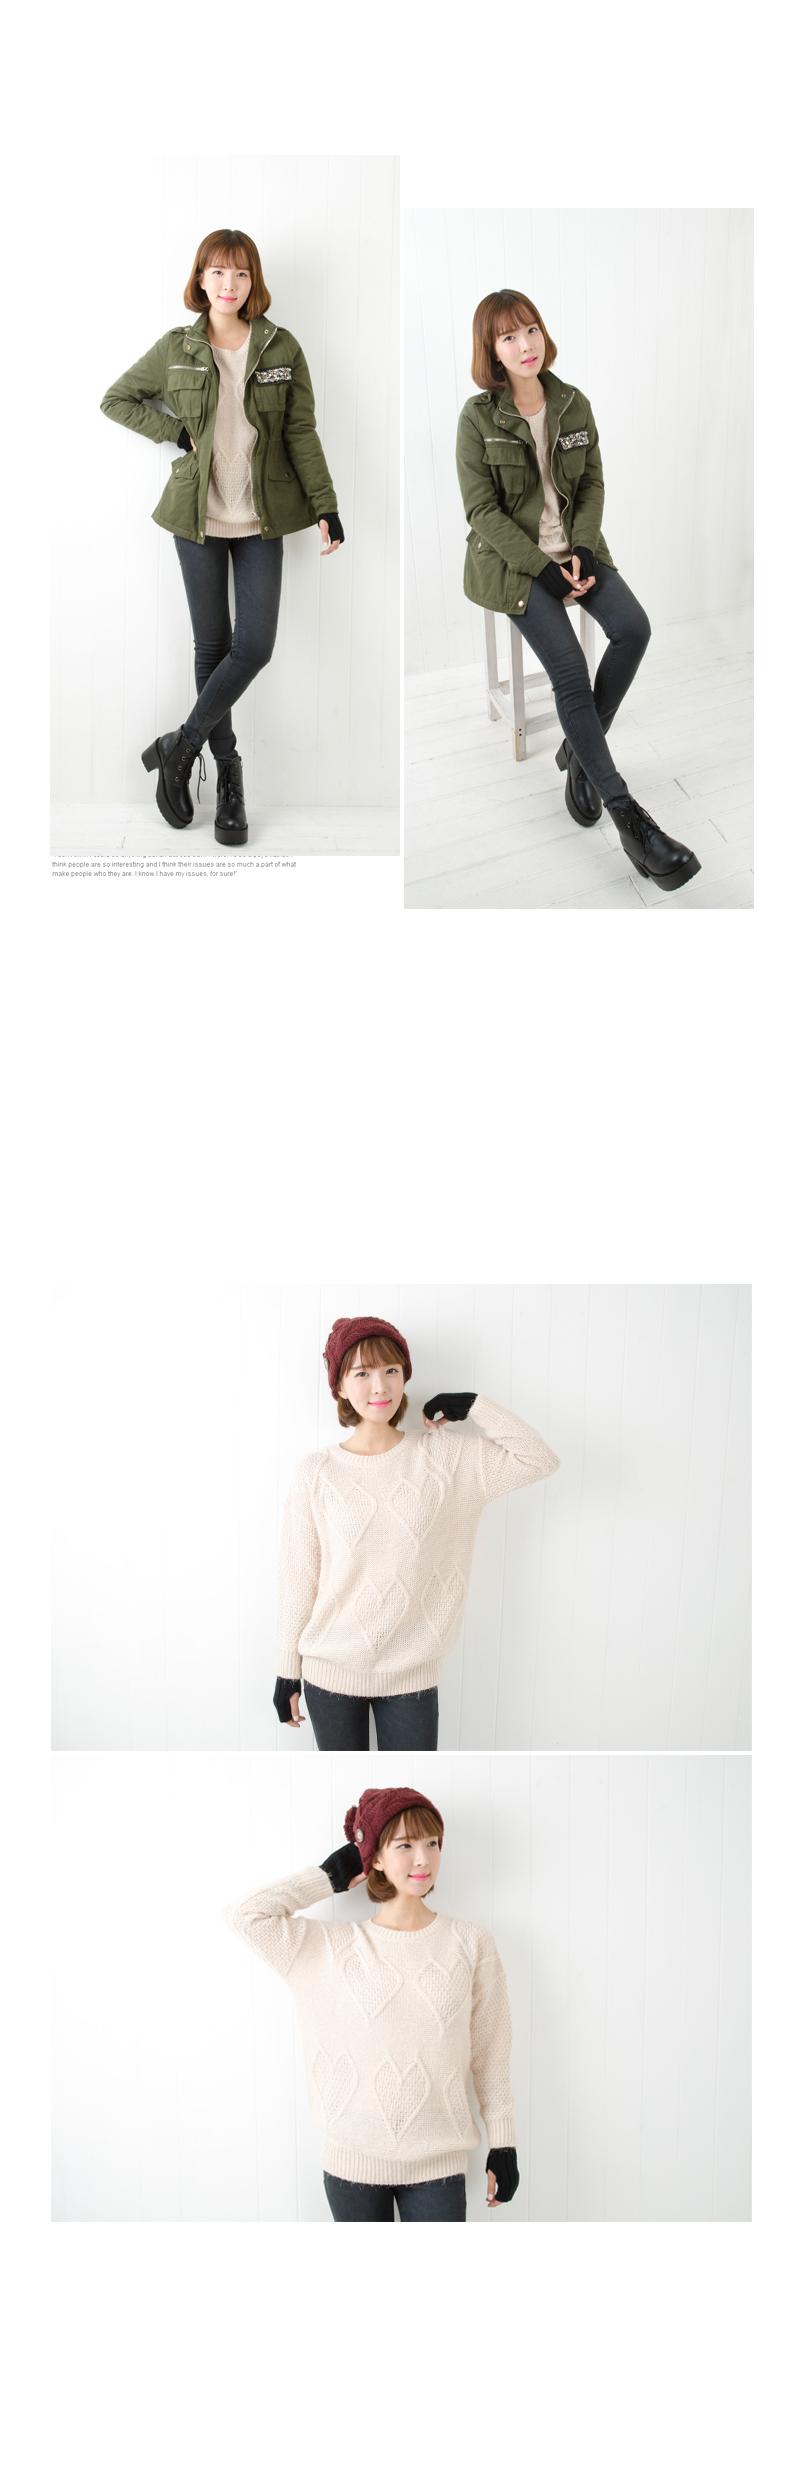 Heart-Pattern Knit Top , Beige , One Size - Cookie 7 | YESSTYLE Hong Kong